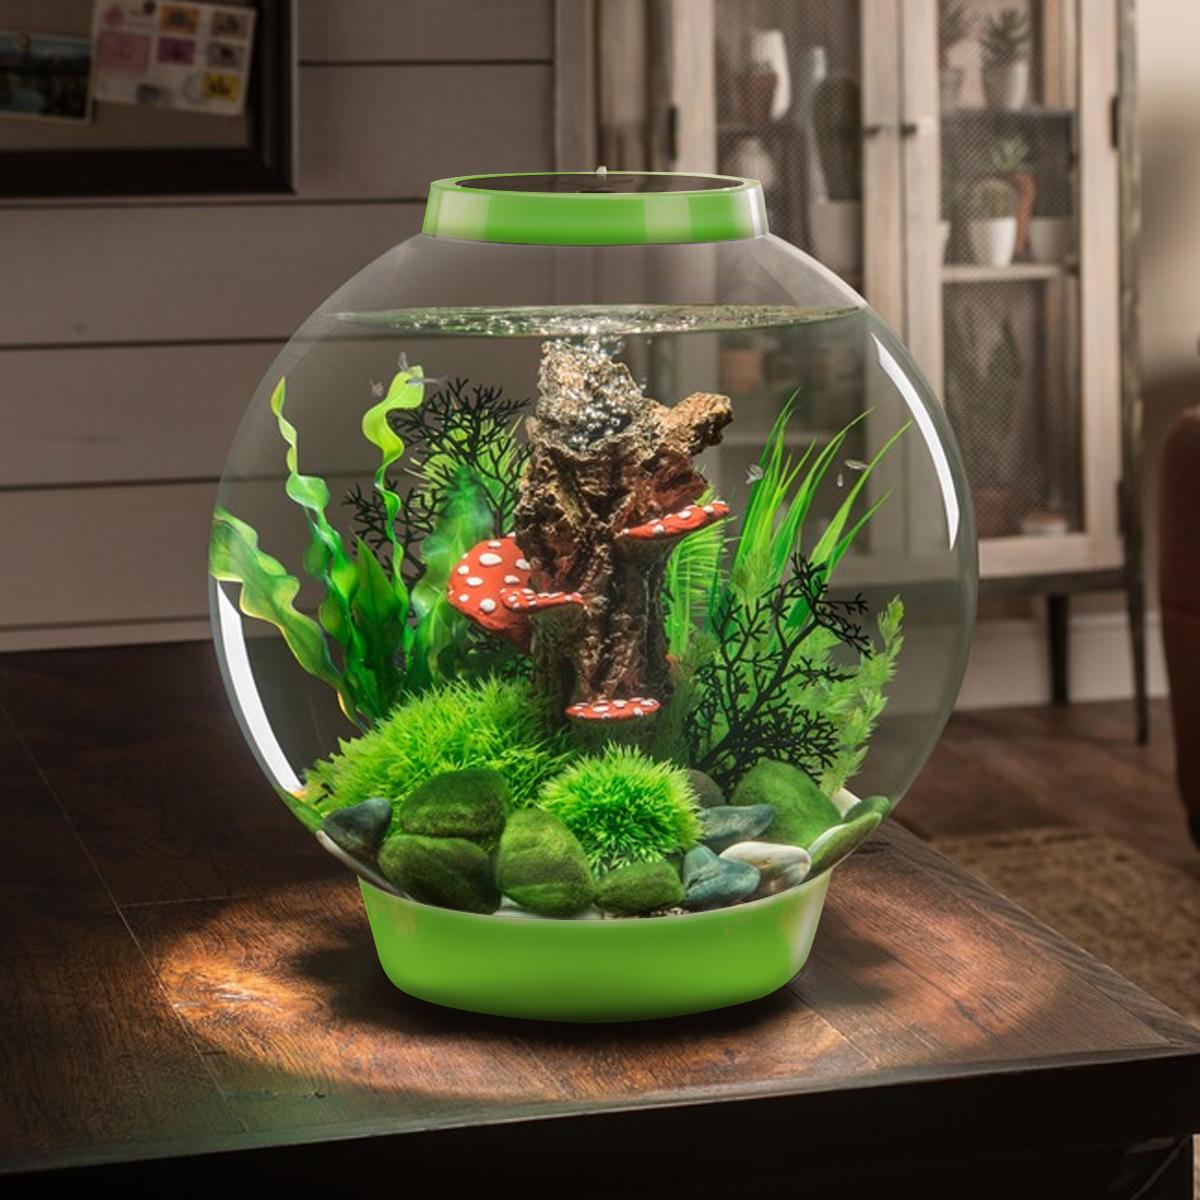 Biorb Classic 30l Leaf Green All In One Aquarium Setup Led